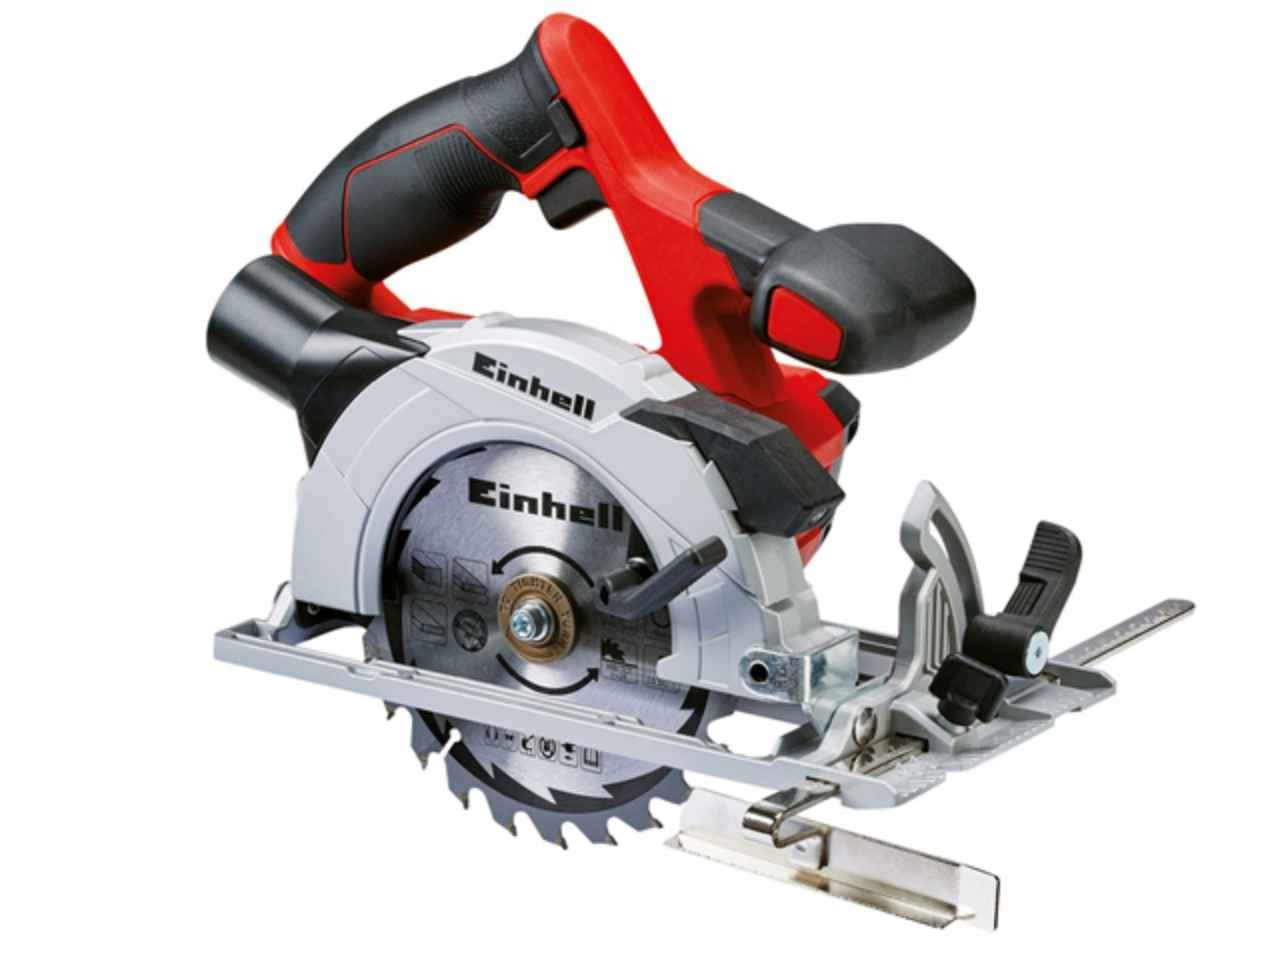 einhell eintecs18lin 18v power x-change circular saw - bare unit